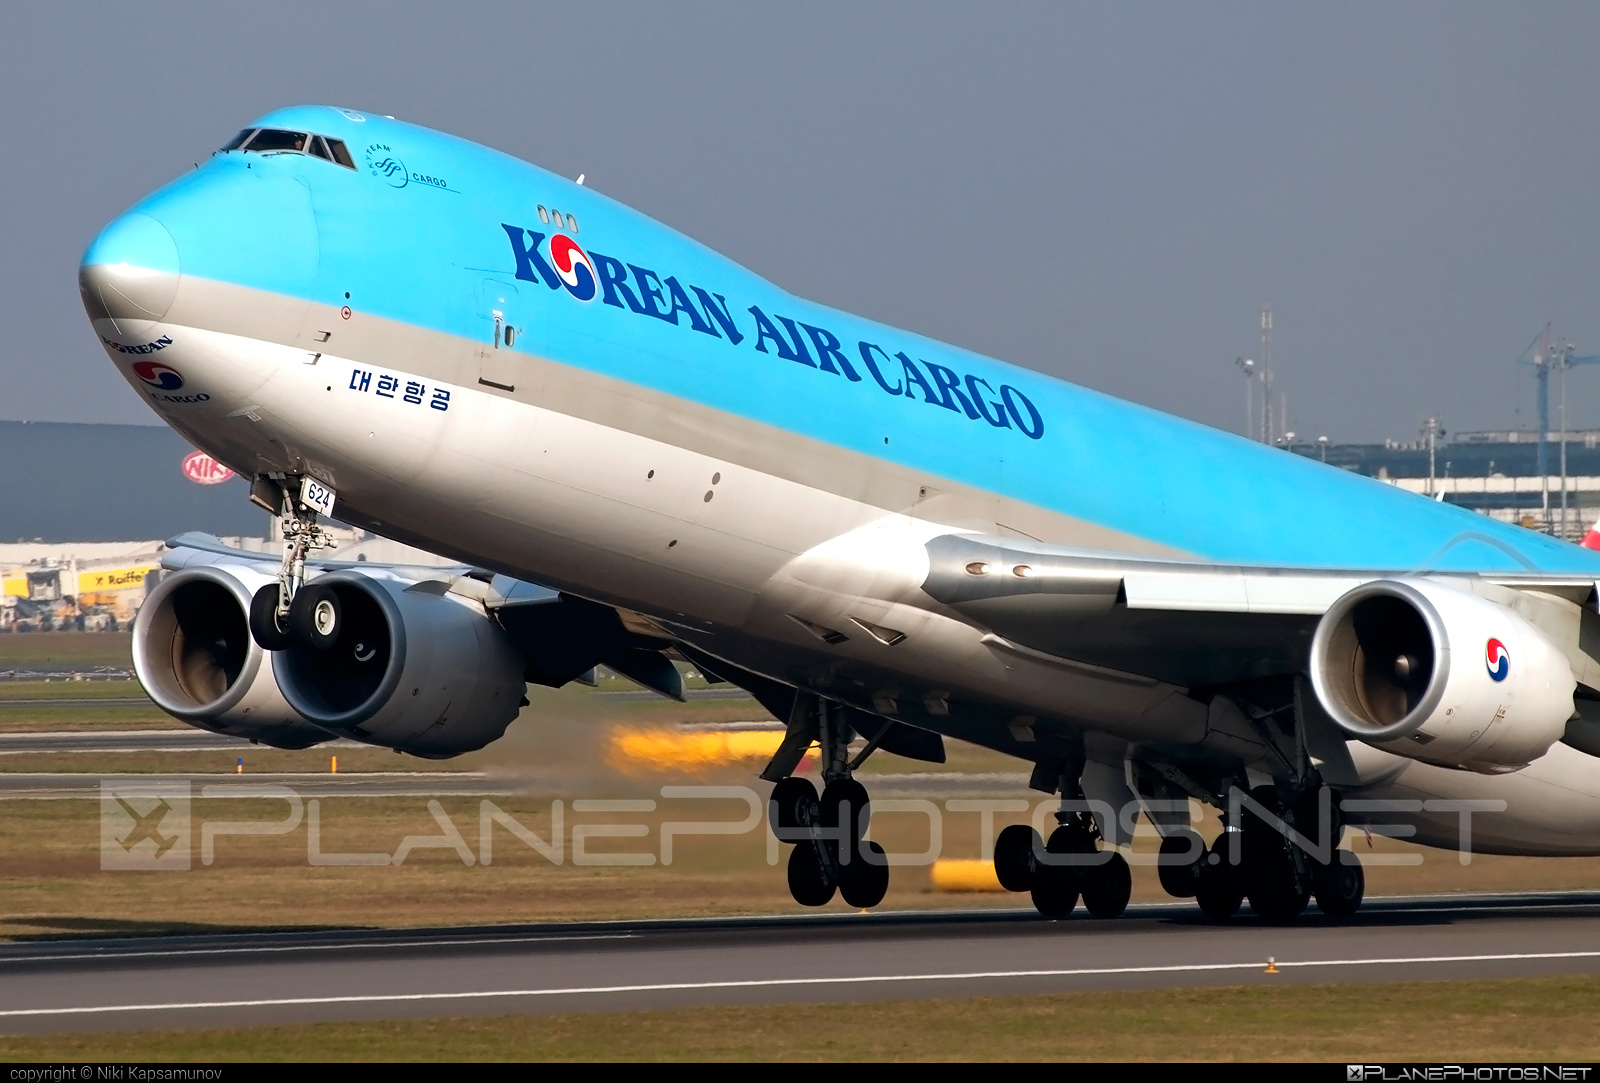 Boeing 747-8F - HL7624 operated by Korean Air Cargo #b747 #b747f #b747freighter #boeing #boeing747 #jumbo #koreanair #koreanaircargo